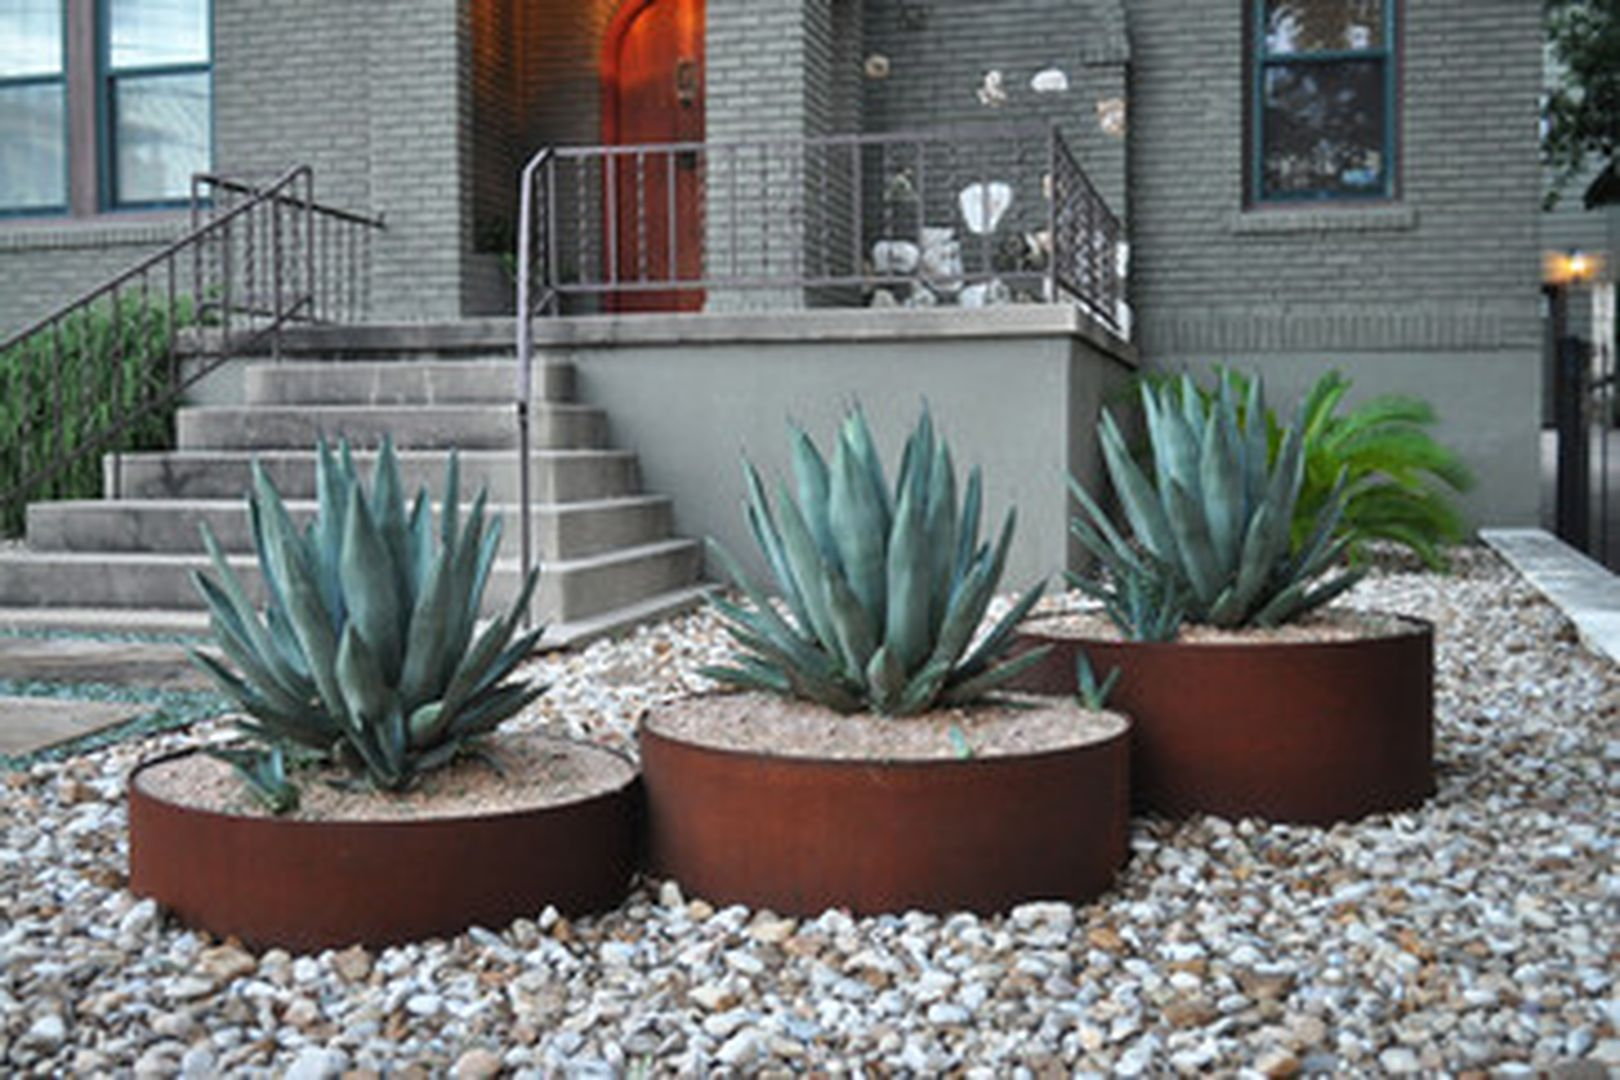 Easy Diy Arizona Backyard Projects Ideas 10 Modern Garden